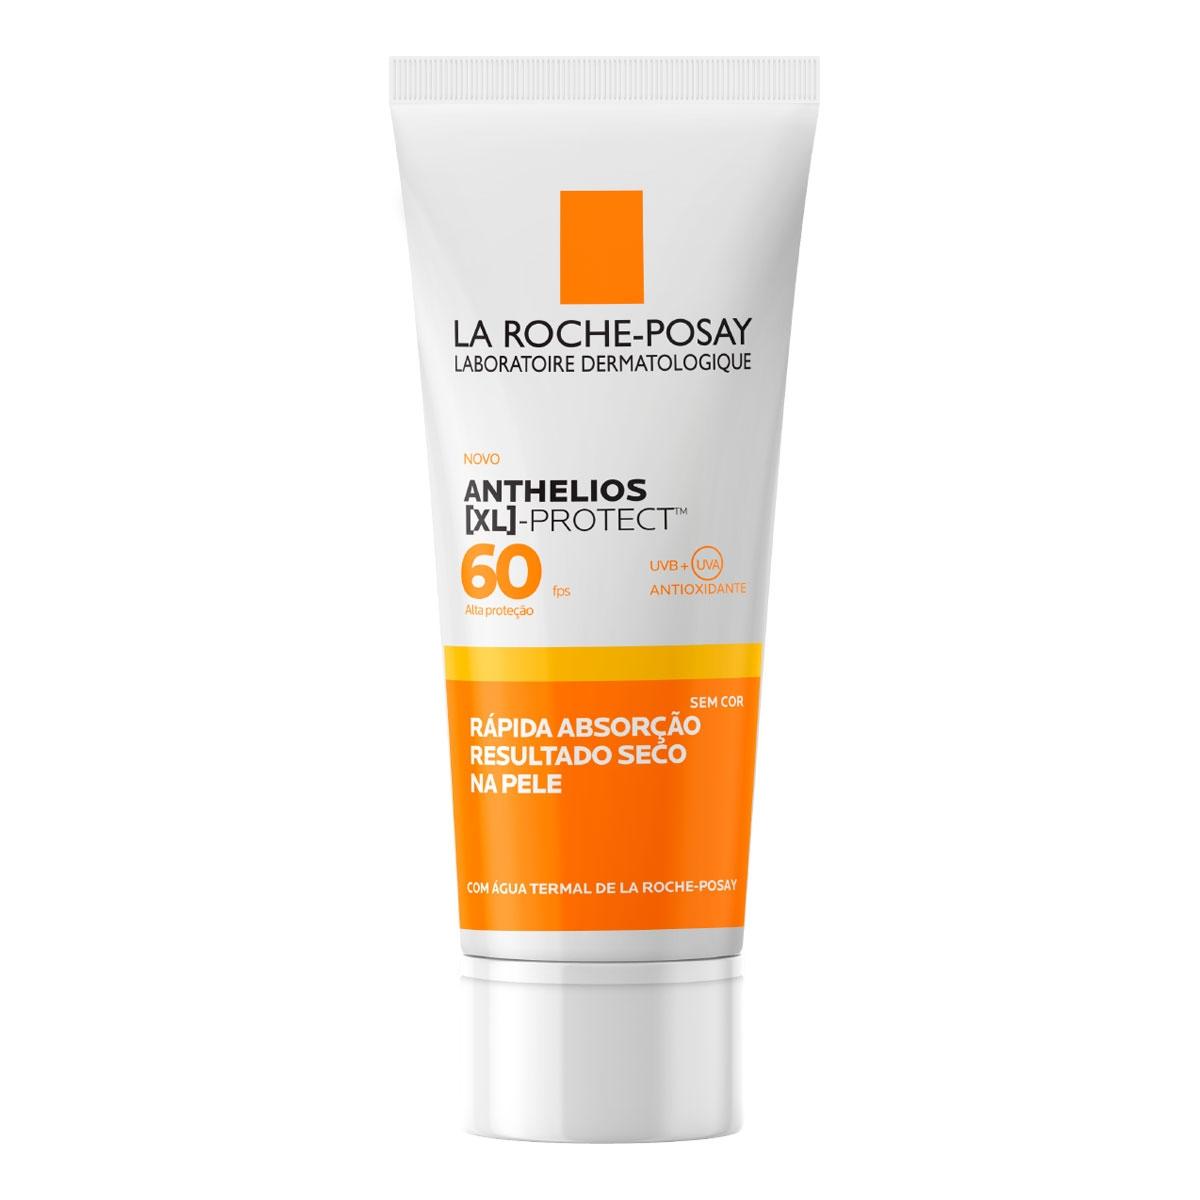 Protetor Solar Facial La Roche-Posay Anthelios XL Protect FPS 60 com 40g 40g